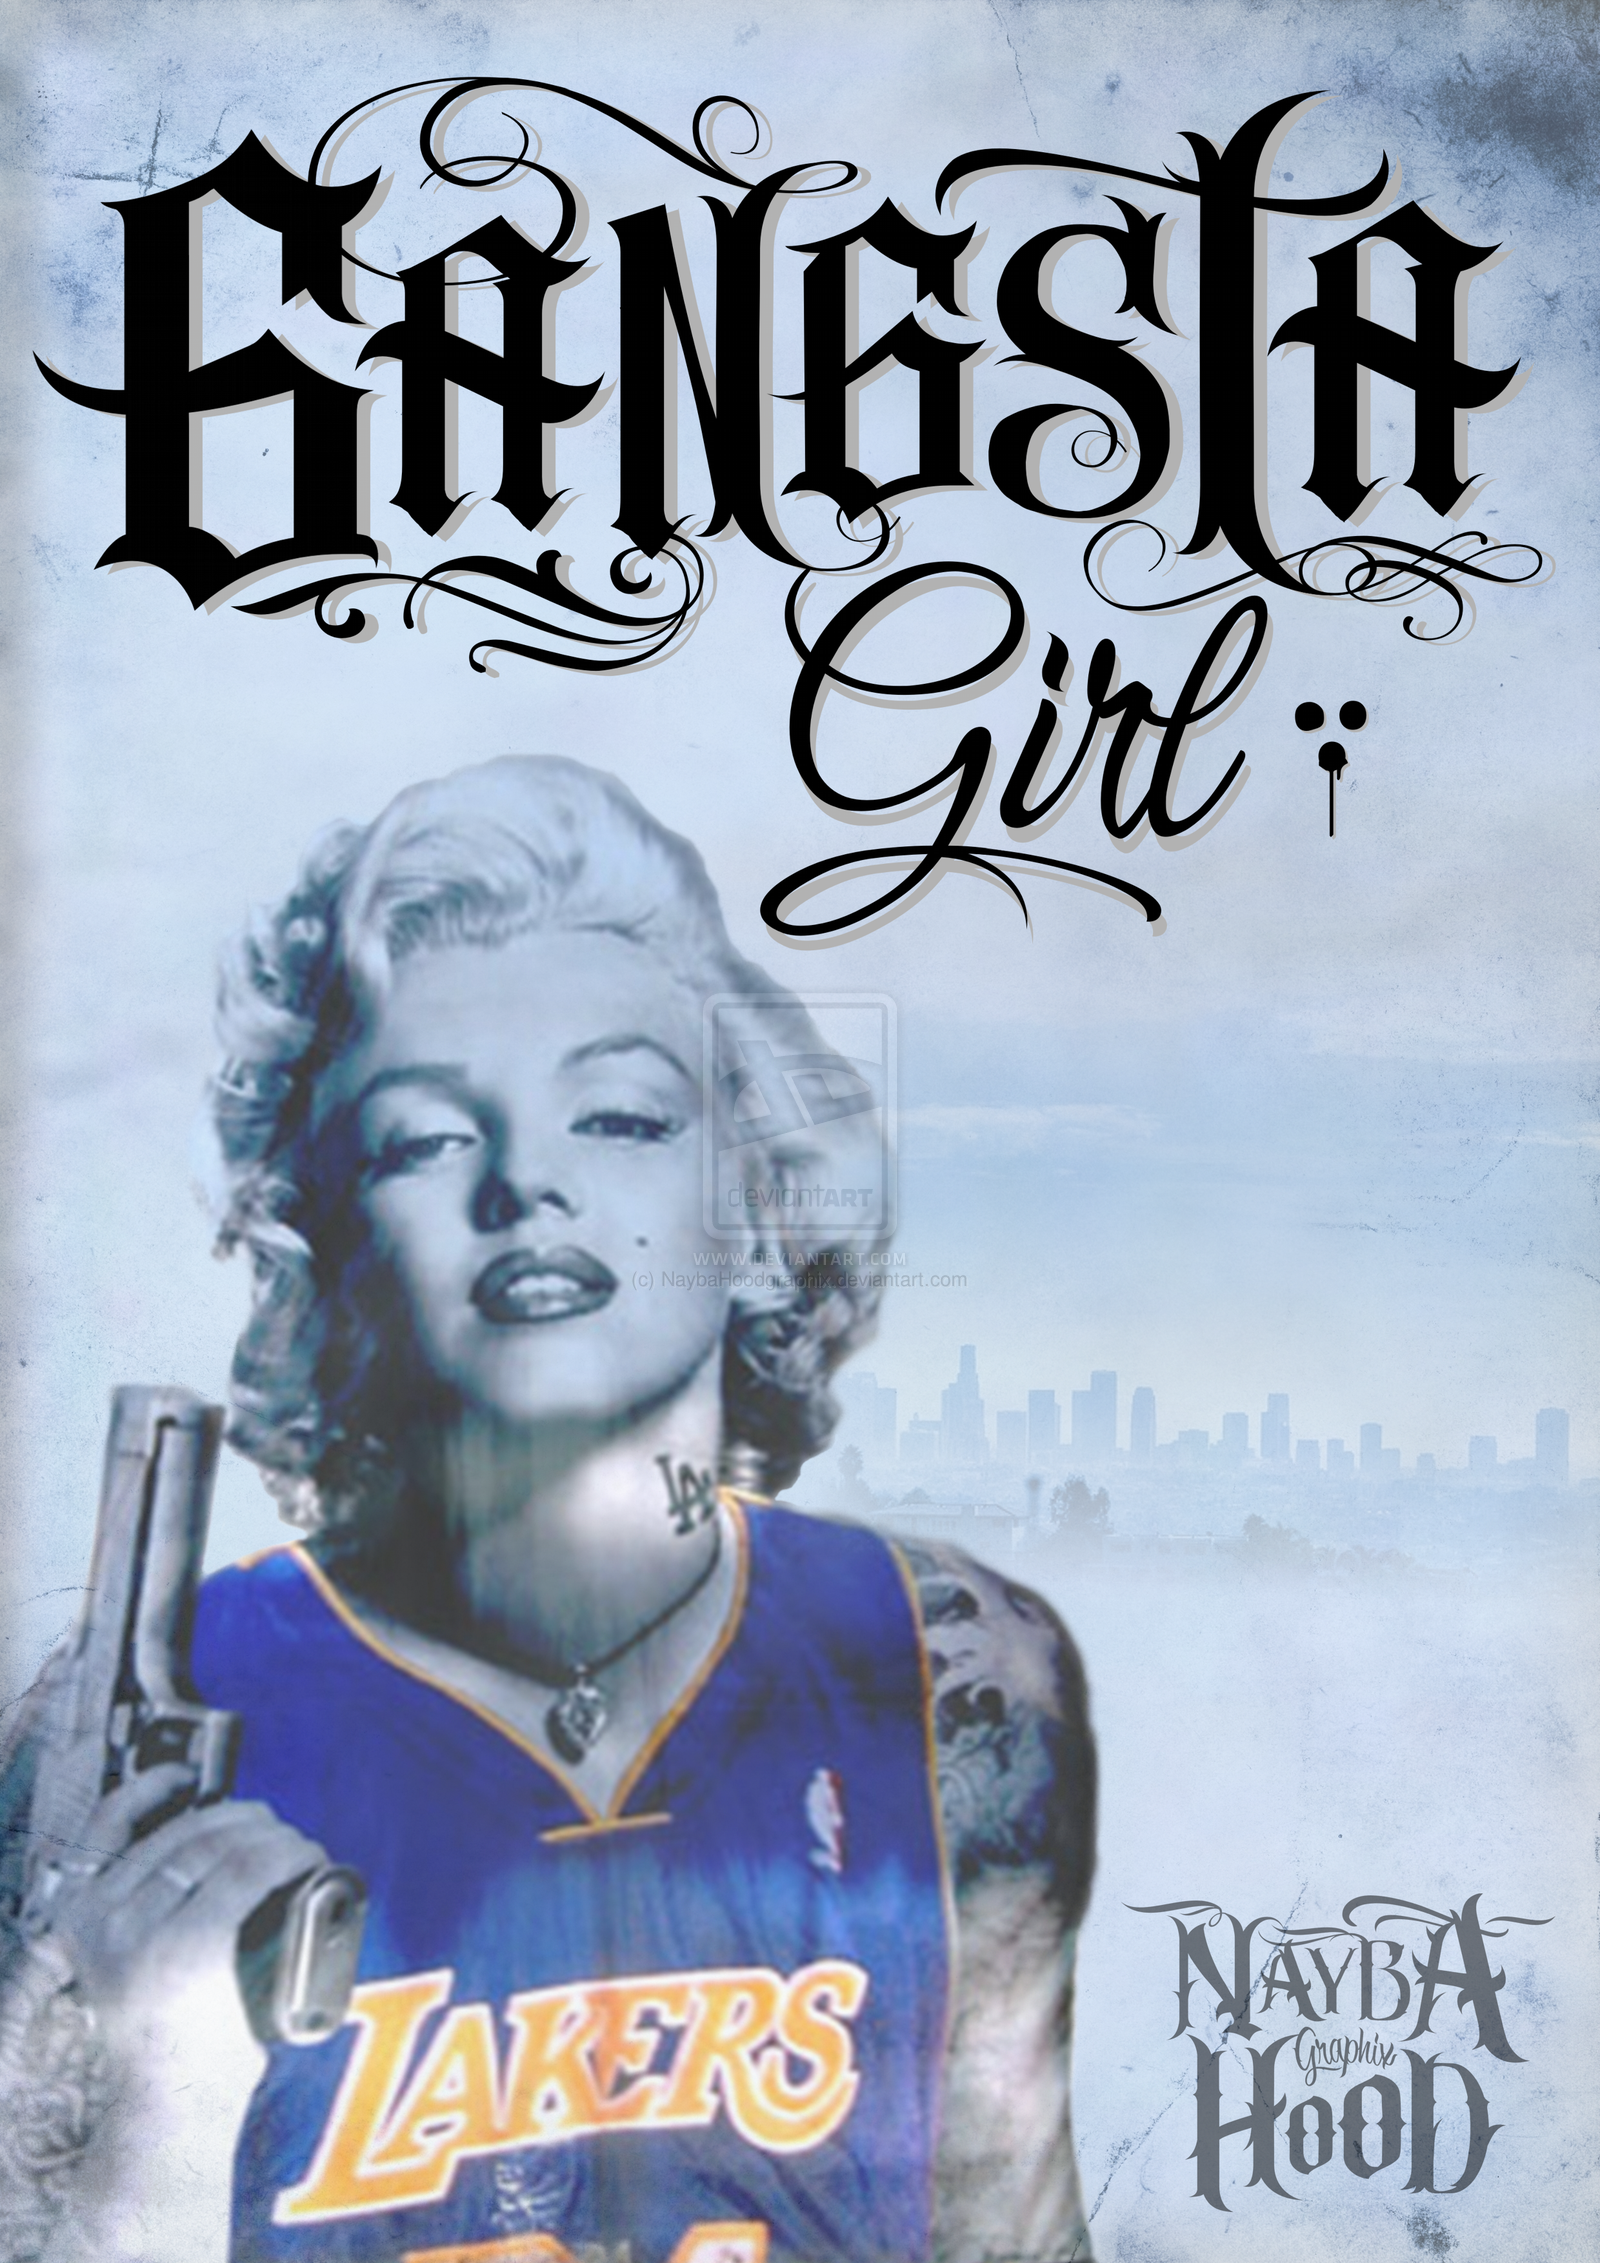 GANGSTA GIRL by NaybaHoodgraphix 1600x2263